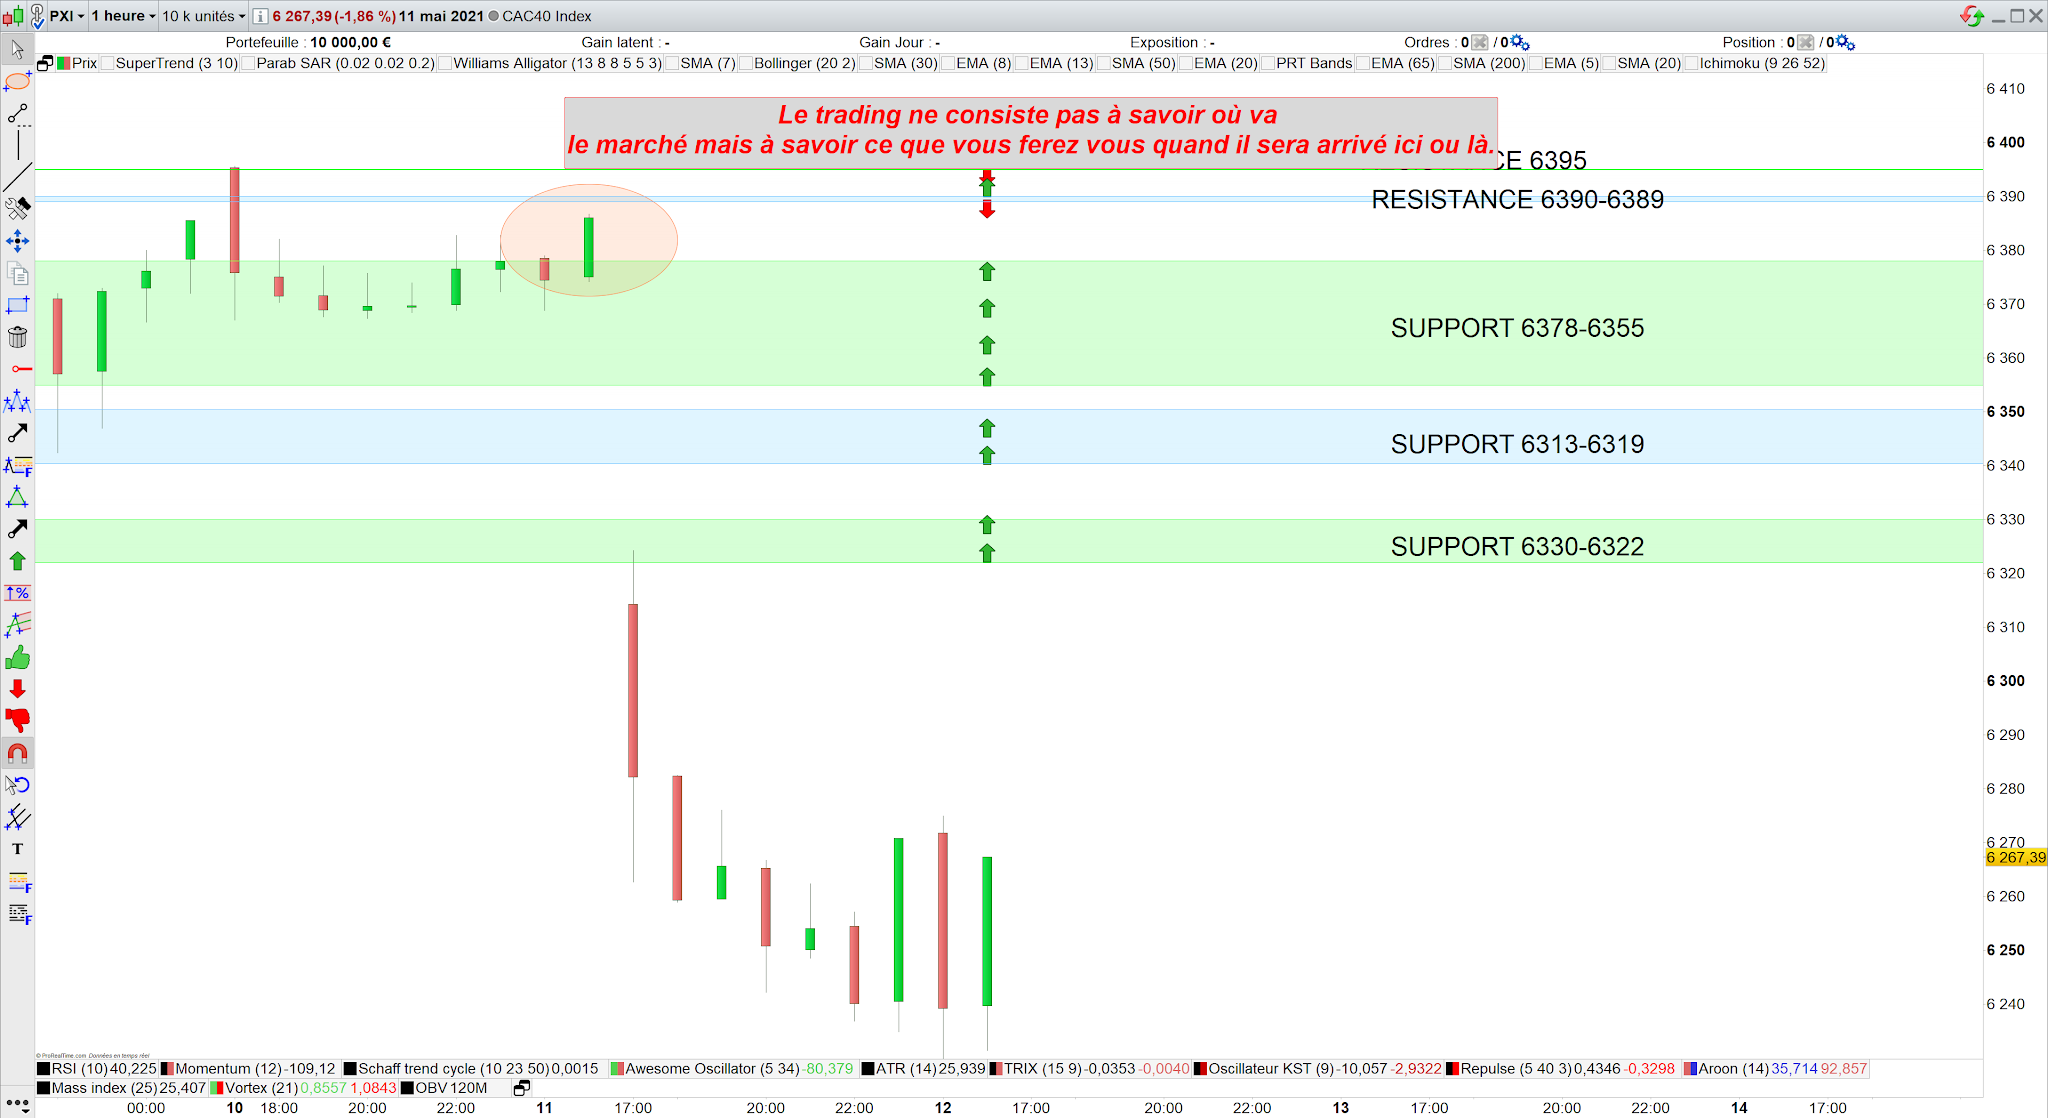 Trading cac 40 11 mai 21 bilan